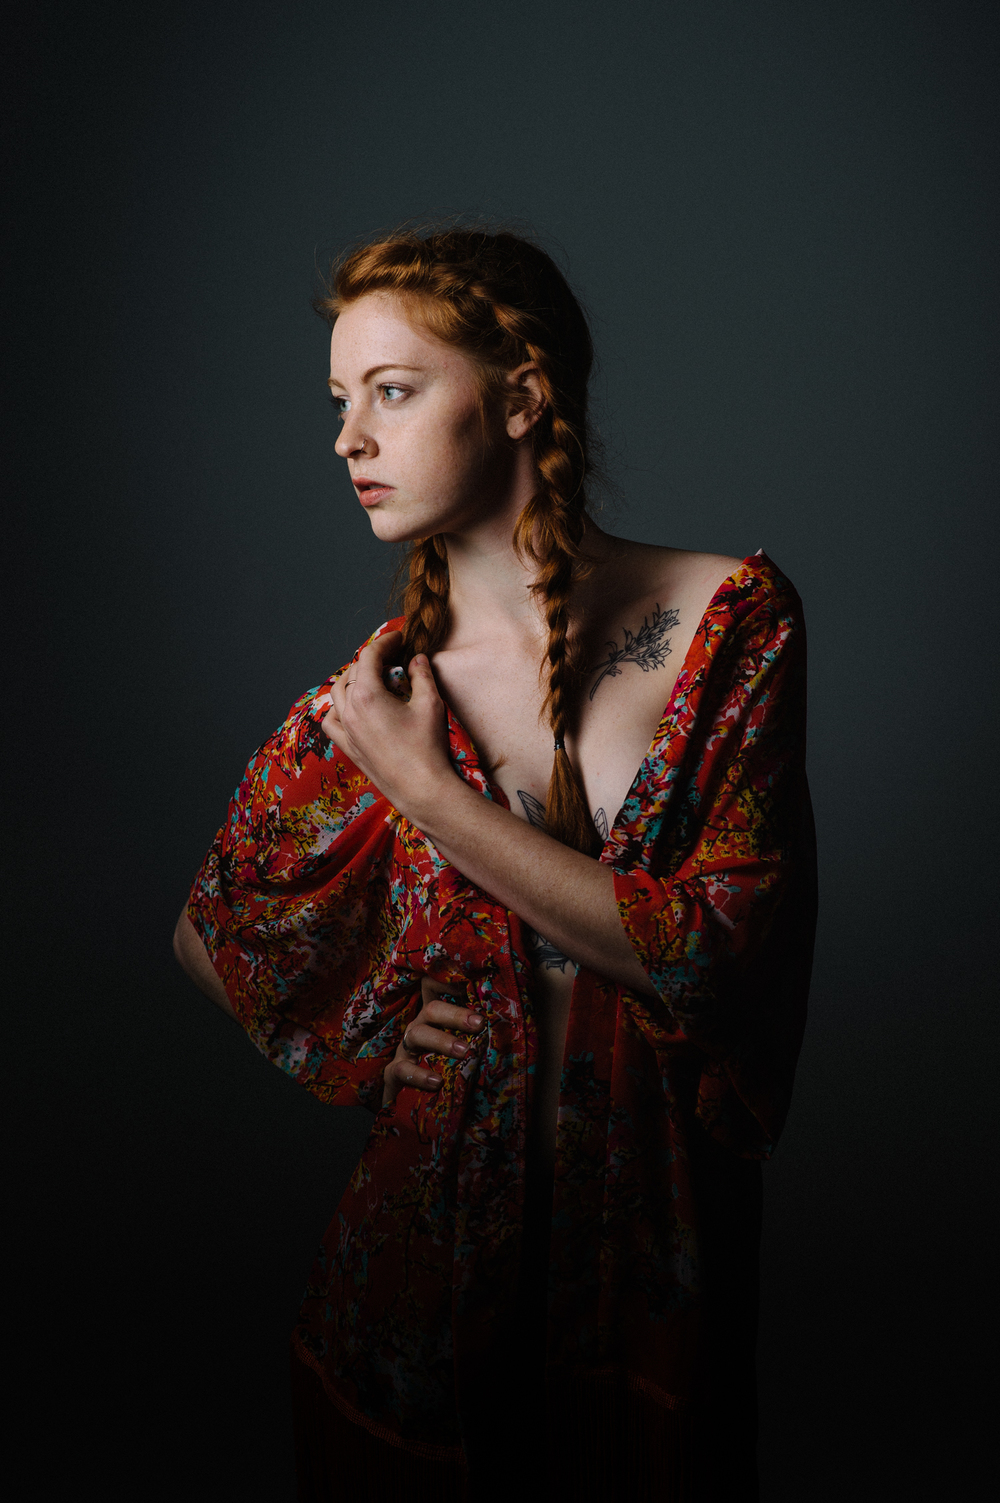 cady-studio-portraits-7910.jpg